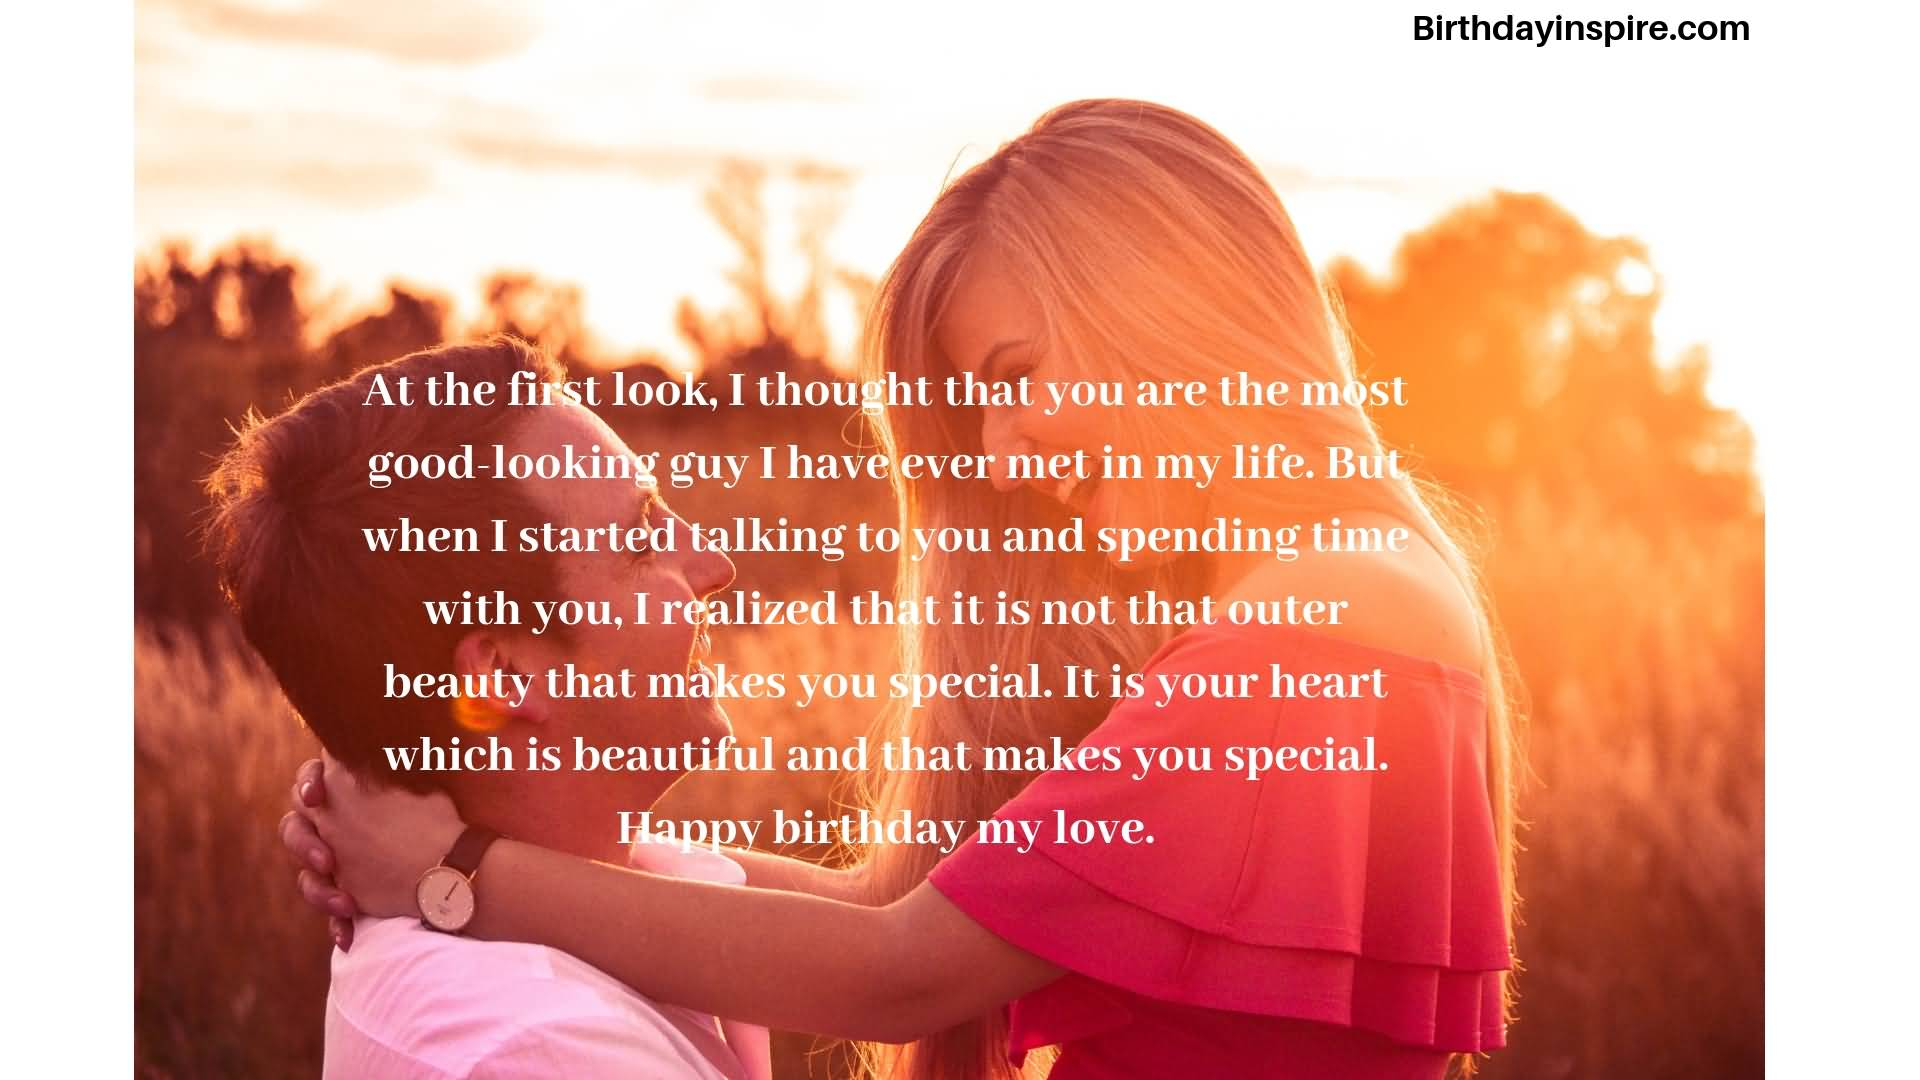 30 happy birthday wishes